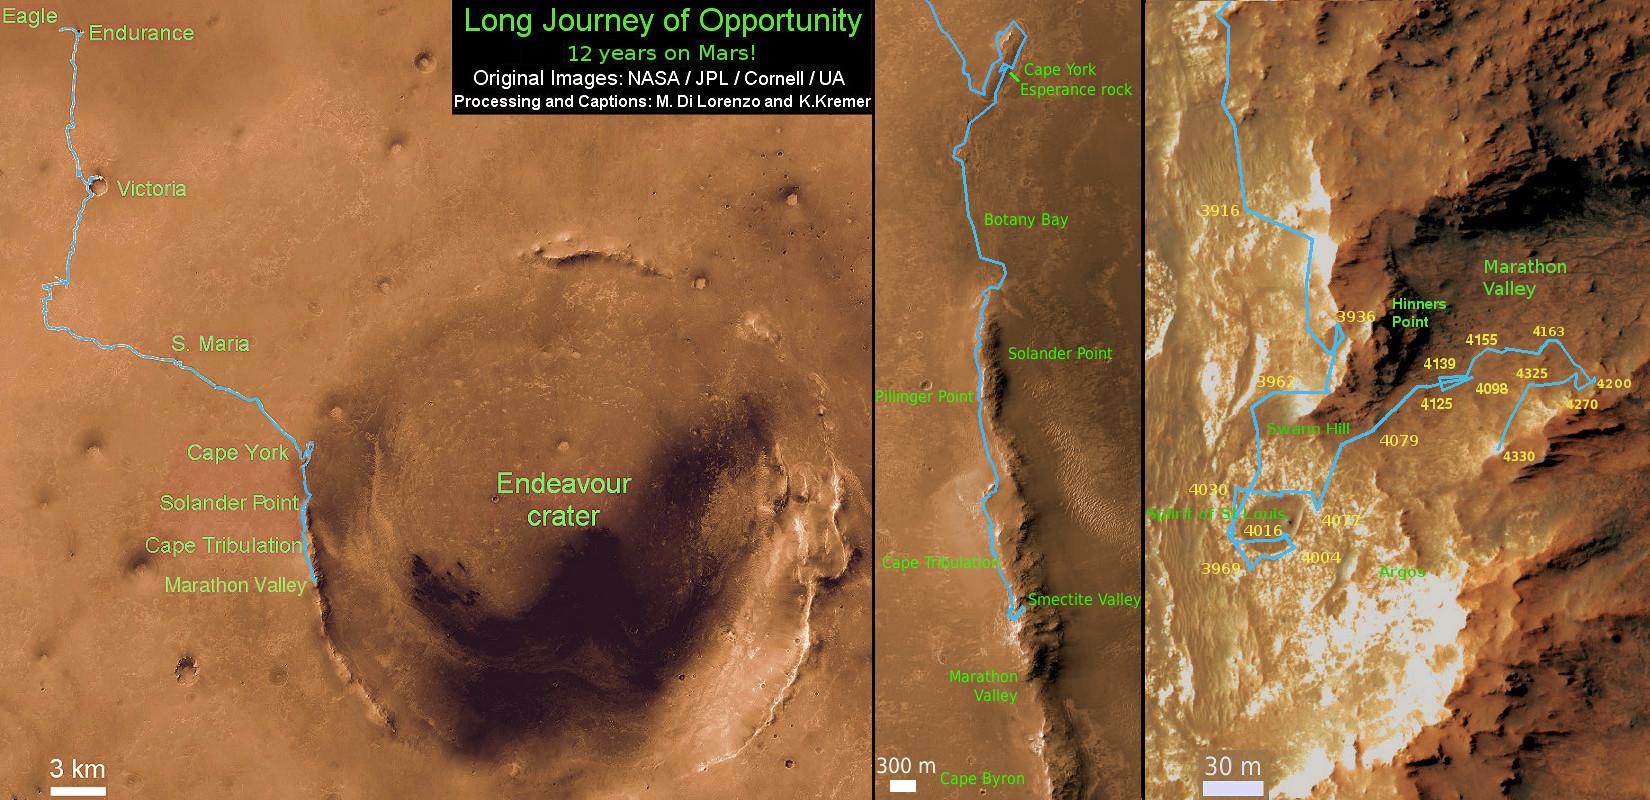 Opportunity Route Map Sol 4332_Ken Kremer